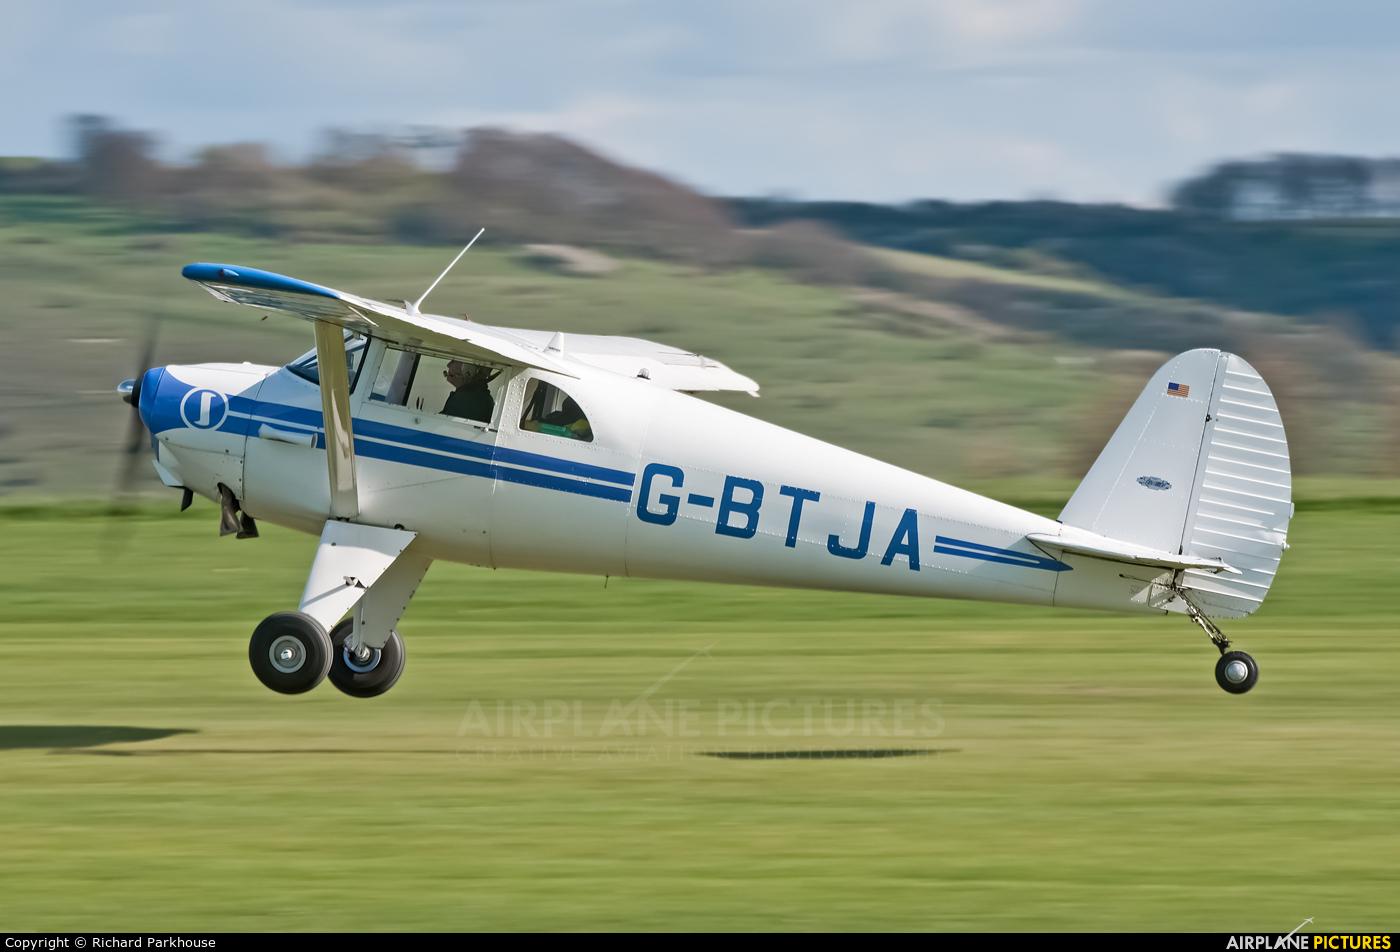 Private G-BTJA aircraft at Old Sarum